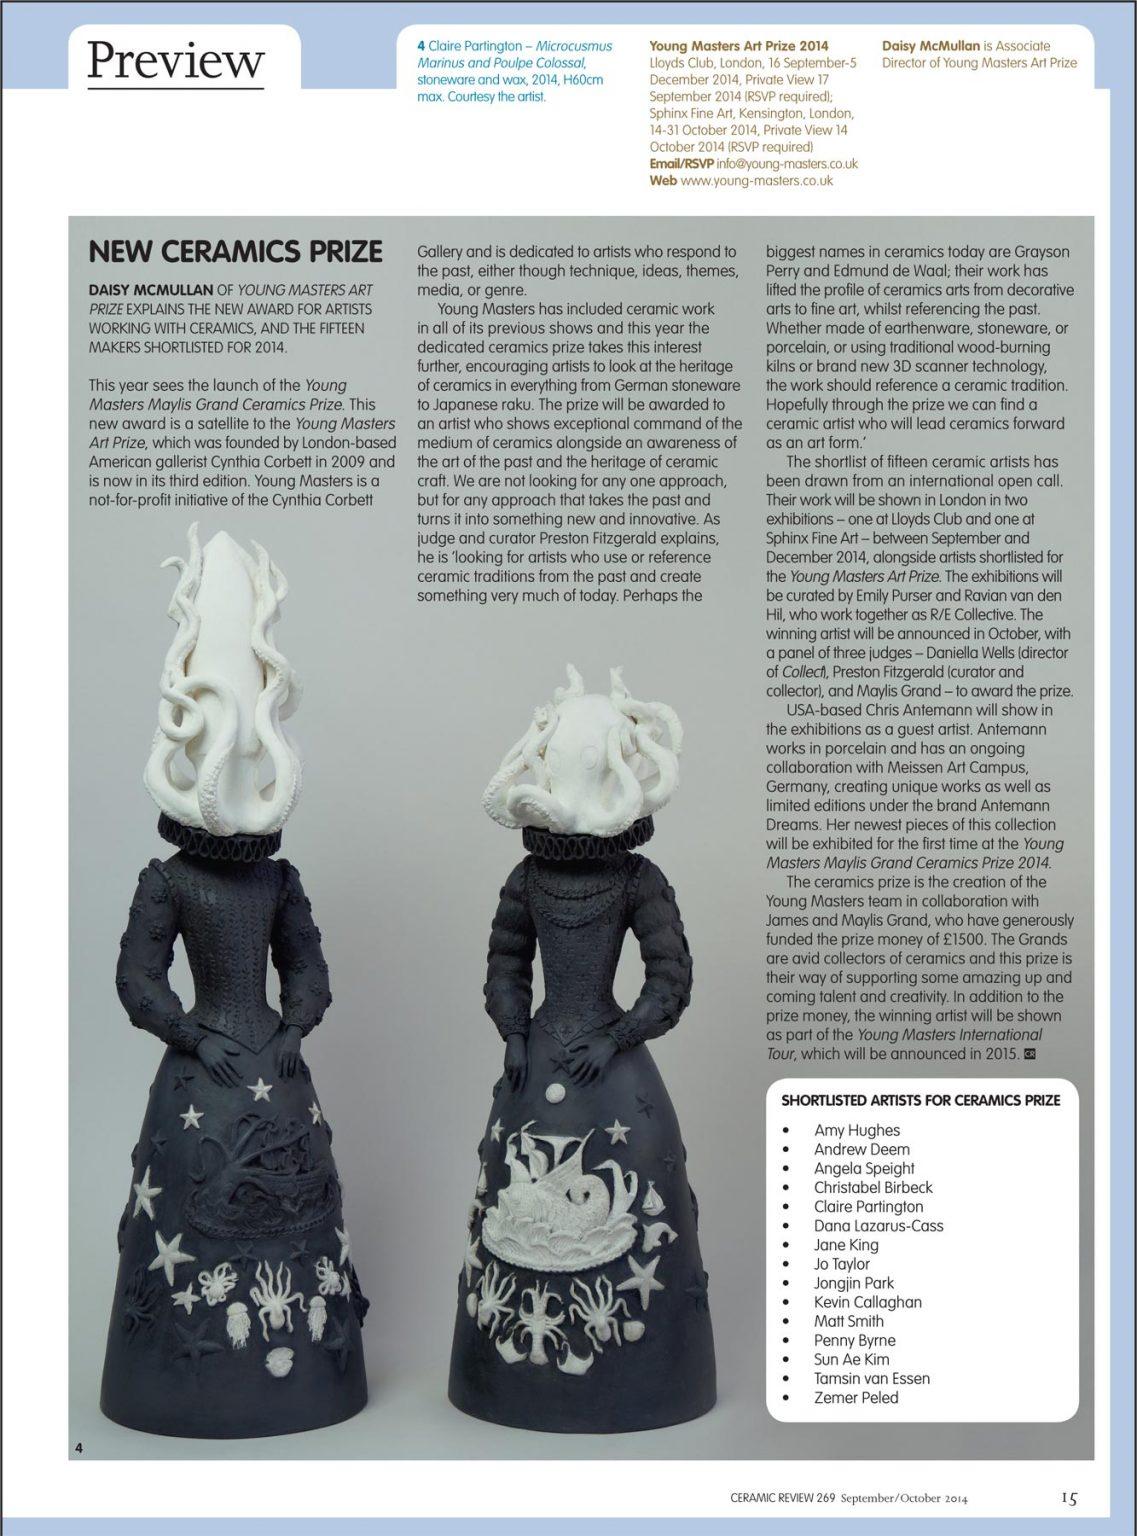 Claire Partington Featured in Ceramic Review